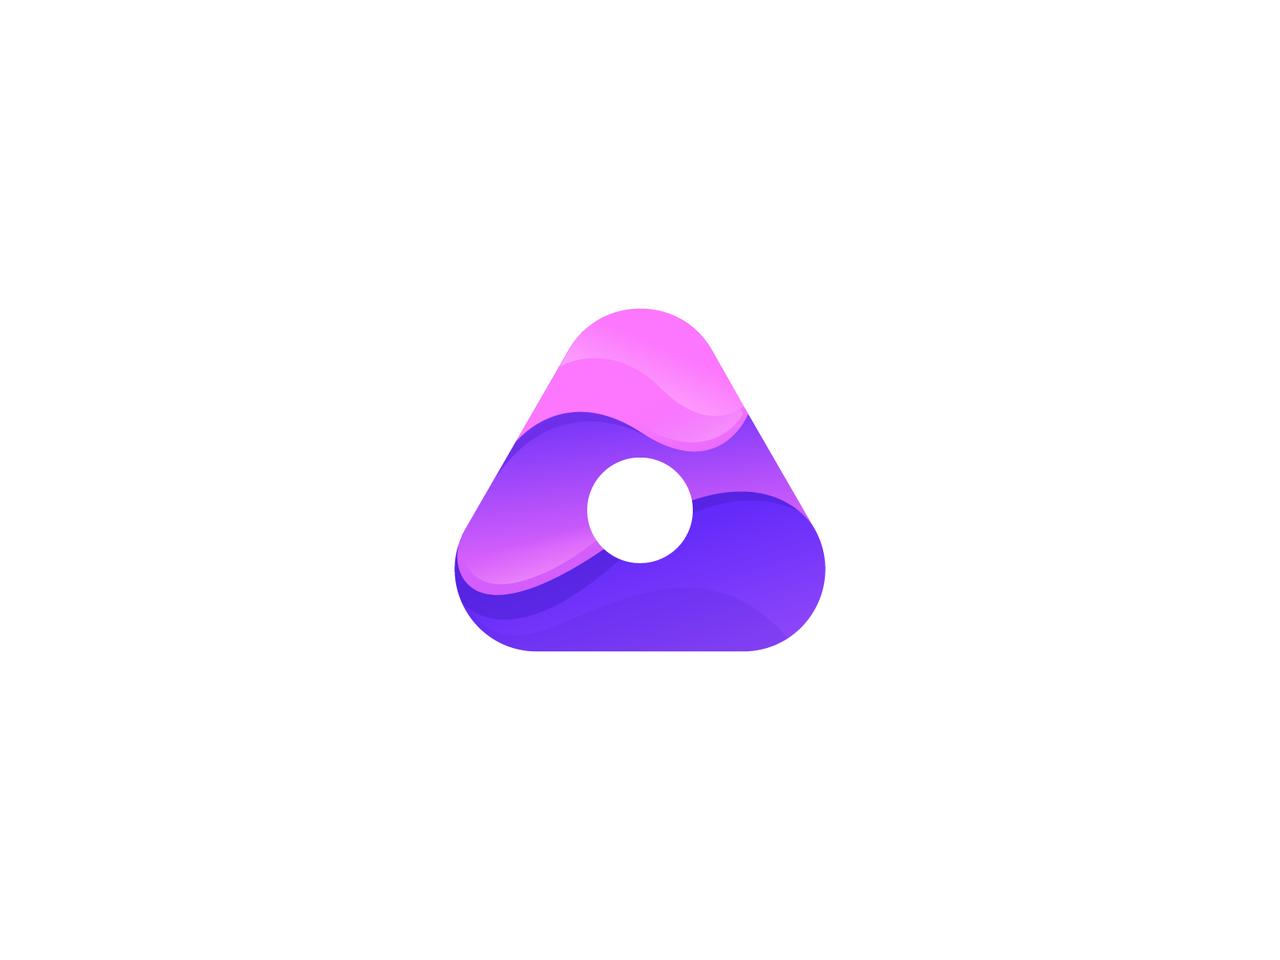 Abstract purple logo